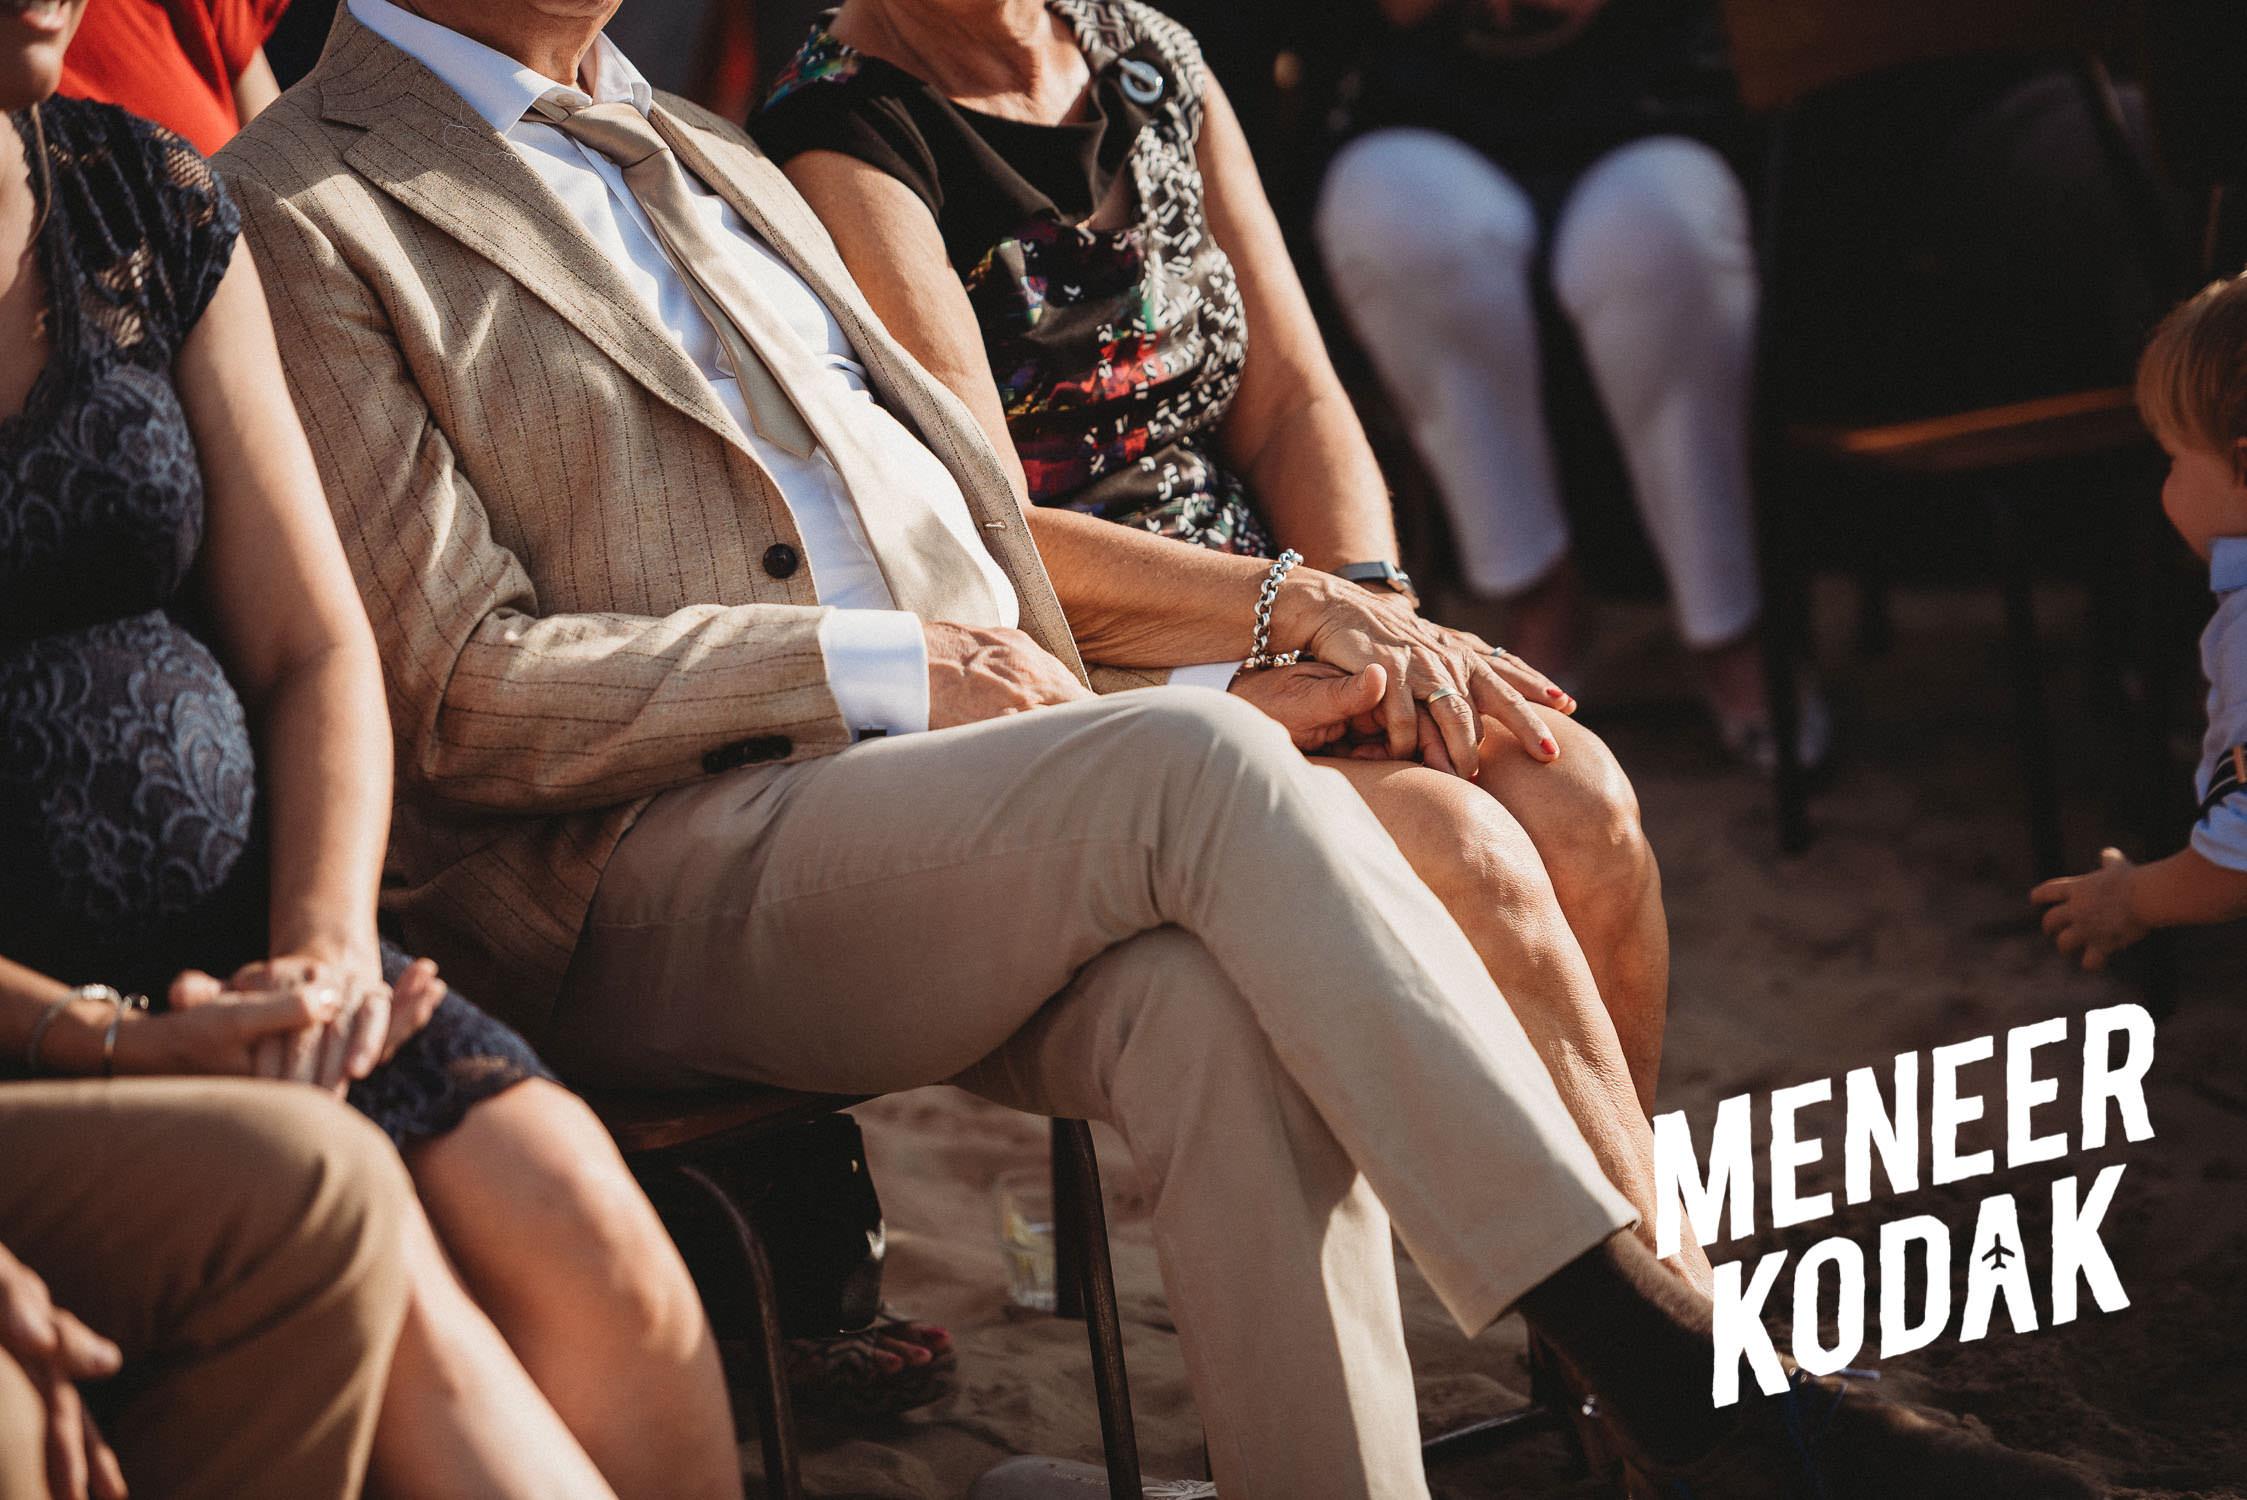 Meneer Kodak - Strandbruiloft - Noordwijk - K&A-098.jpg